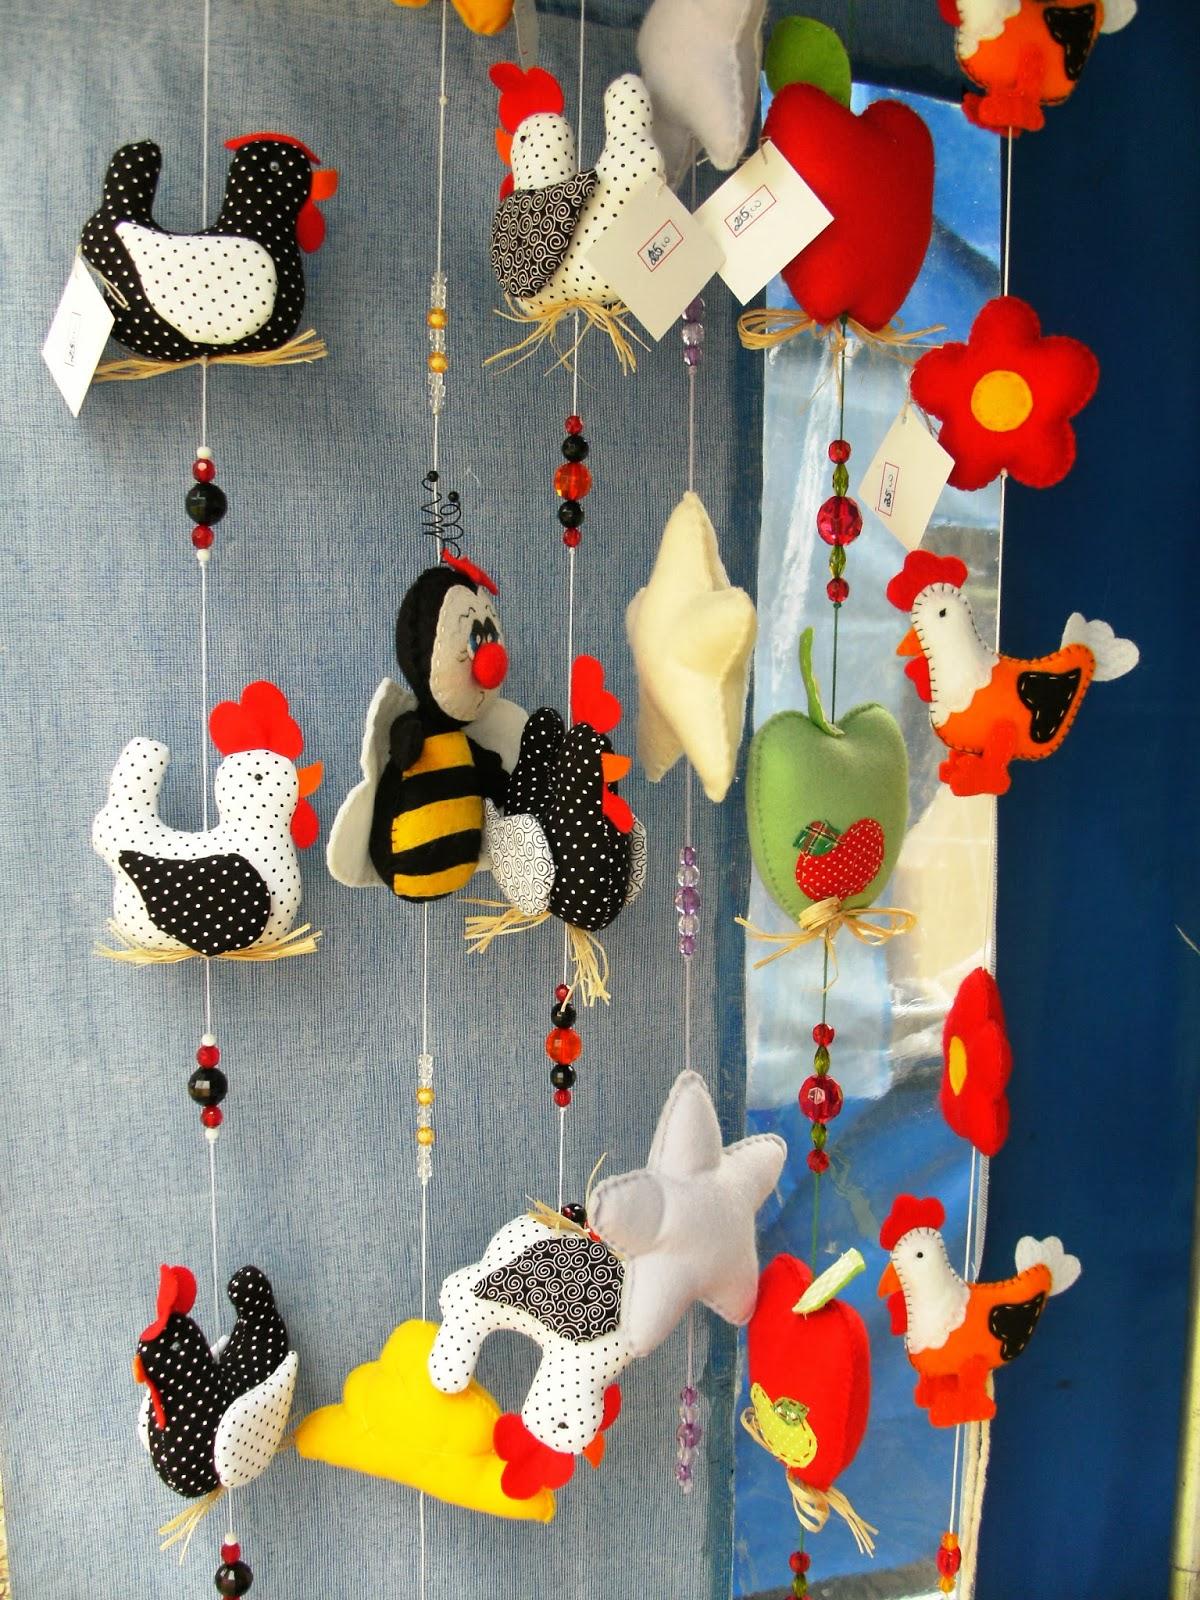 Armario Ropero Sinonimos ~ feira de artesanato em Sorocaba BONECAS DE PANO PESOS DE PORTA